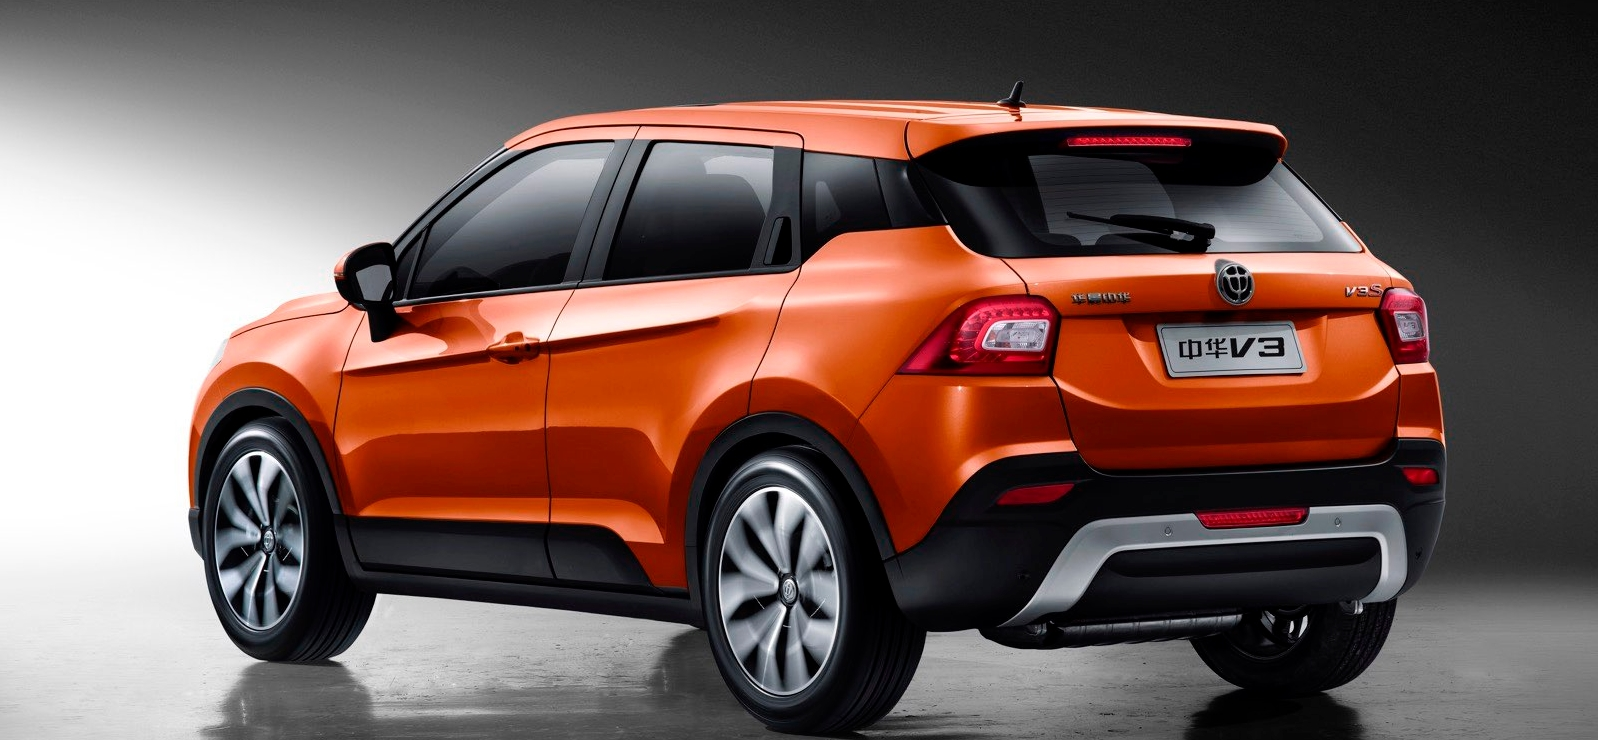 Автомобили Brilliance (Брилианс): модели, новинки